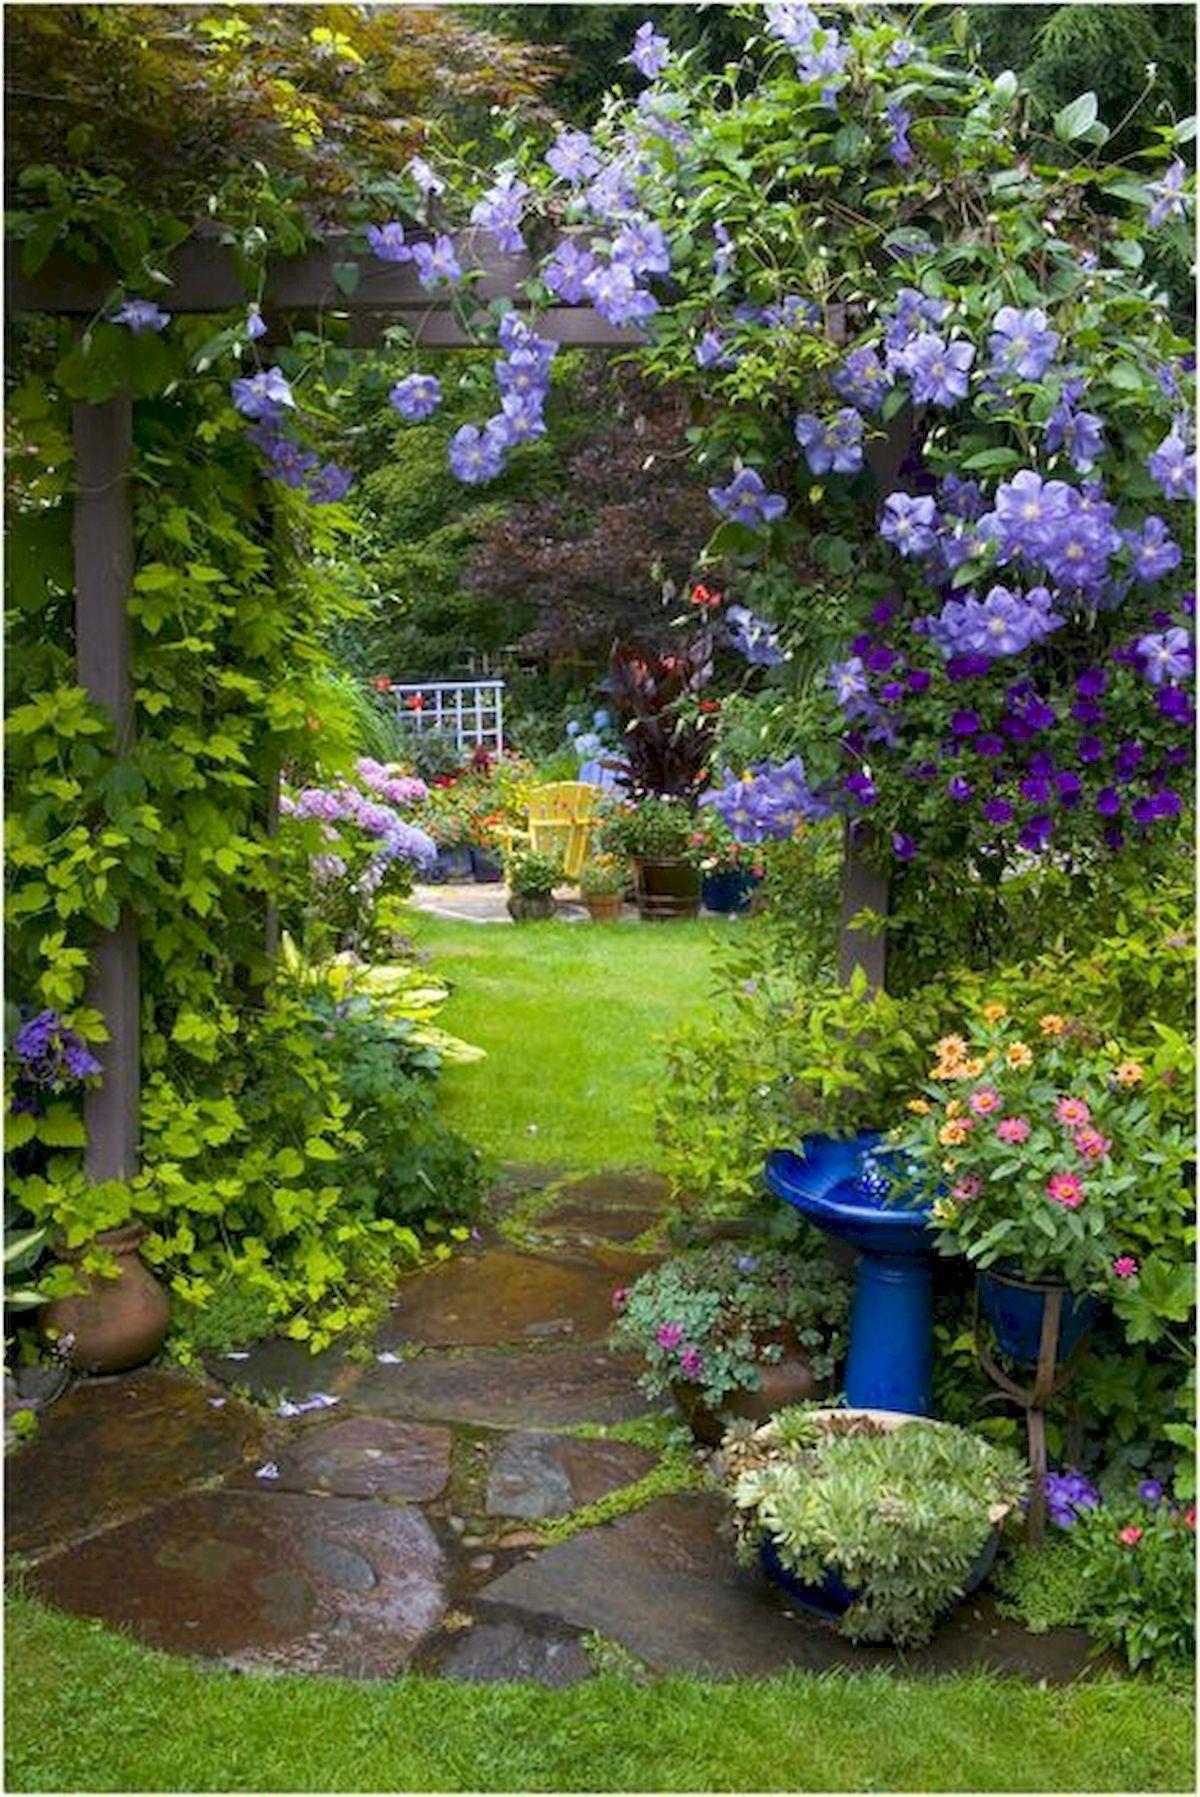 40 Amazing Secret Garden Design Ideas For Summer 39 Small